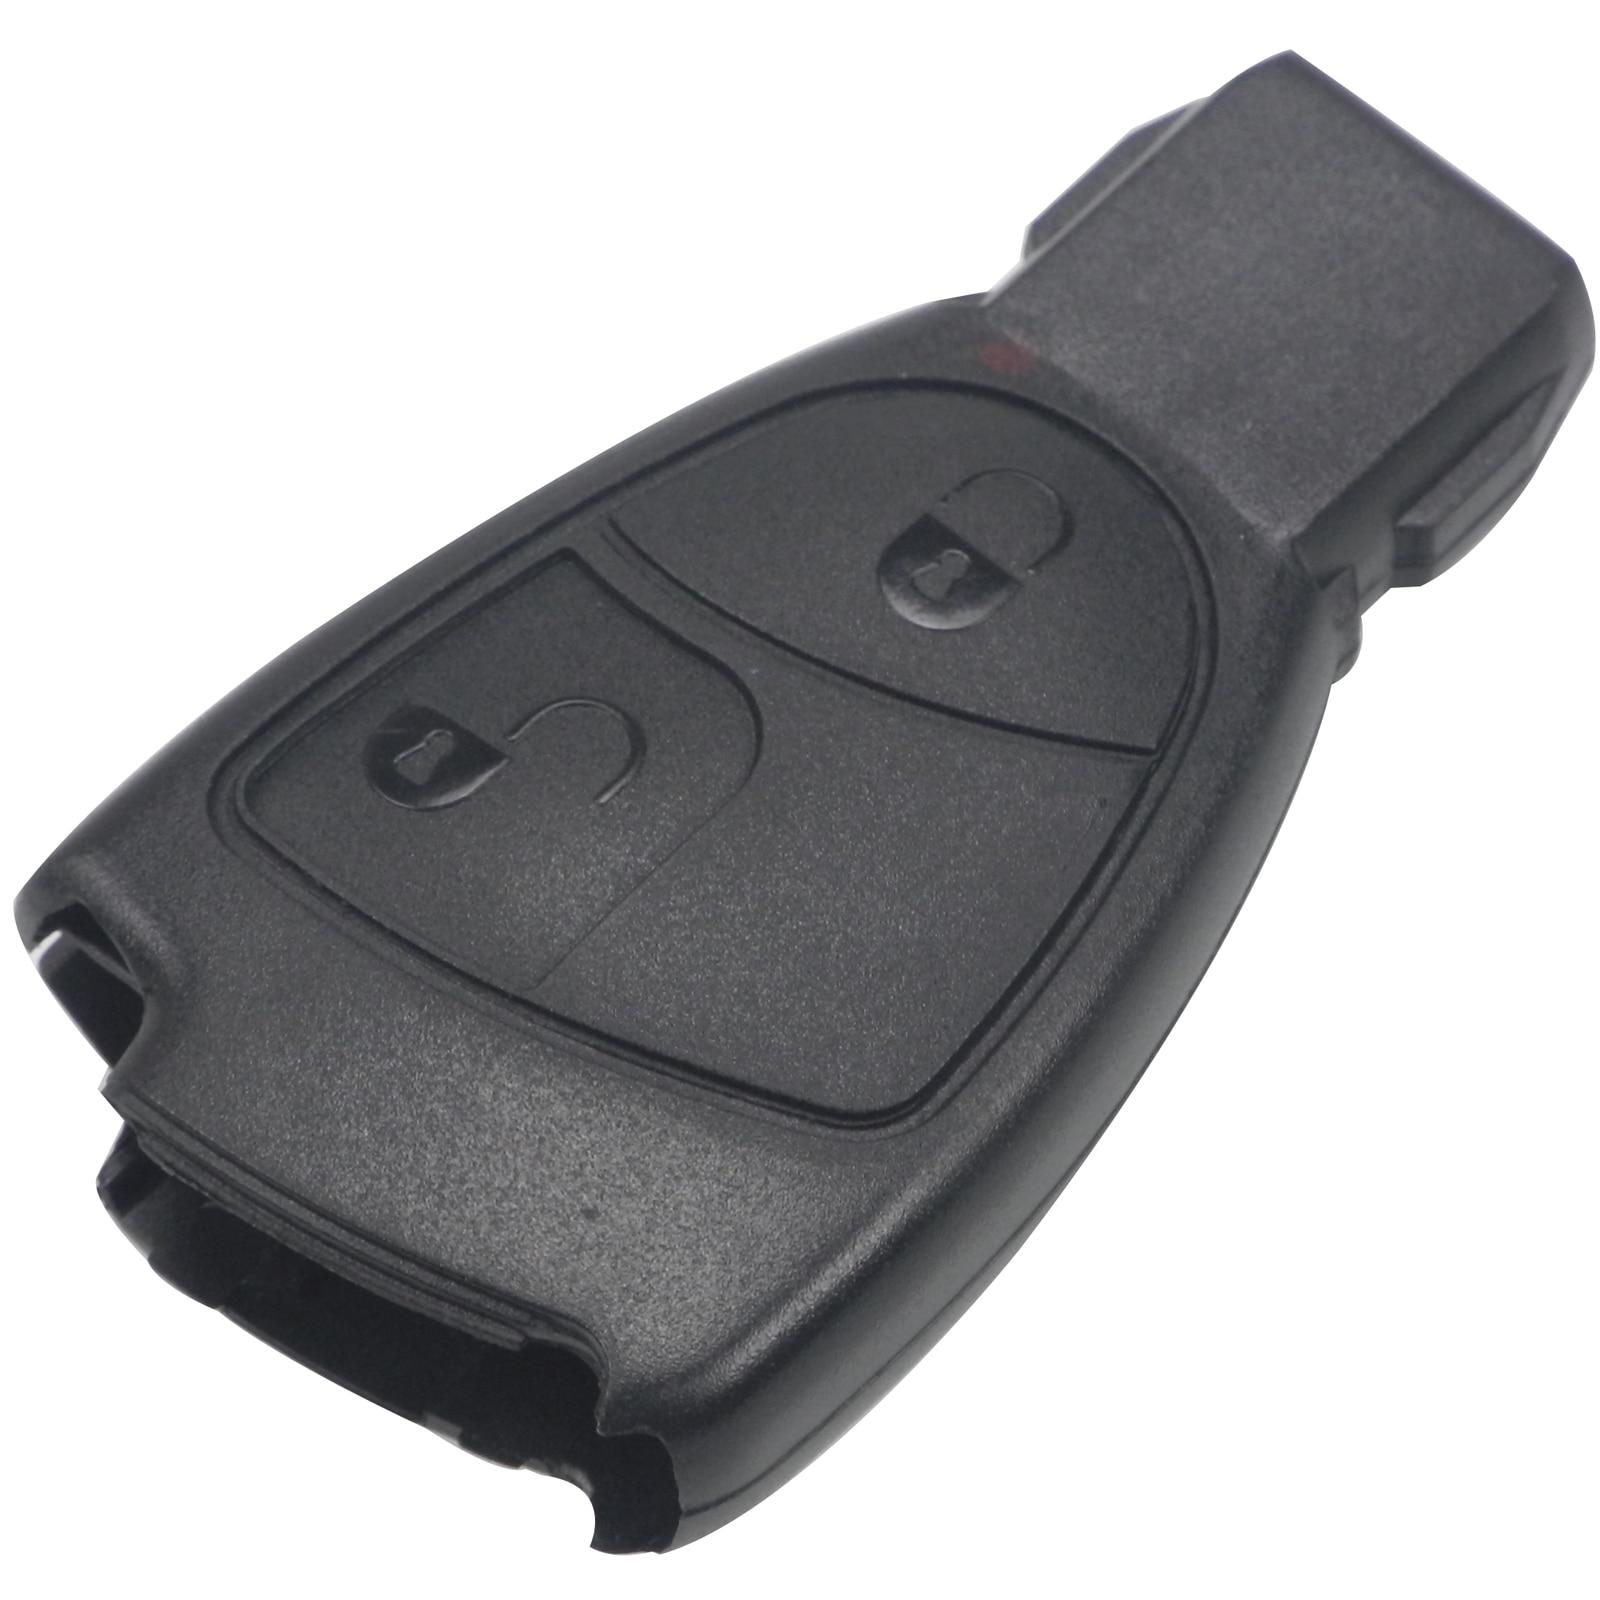 Jingyuqin 2 Button Remote Smart Car Key Shell Case Fob For